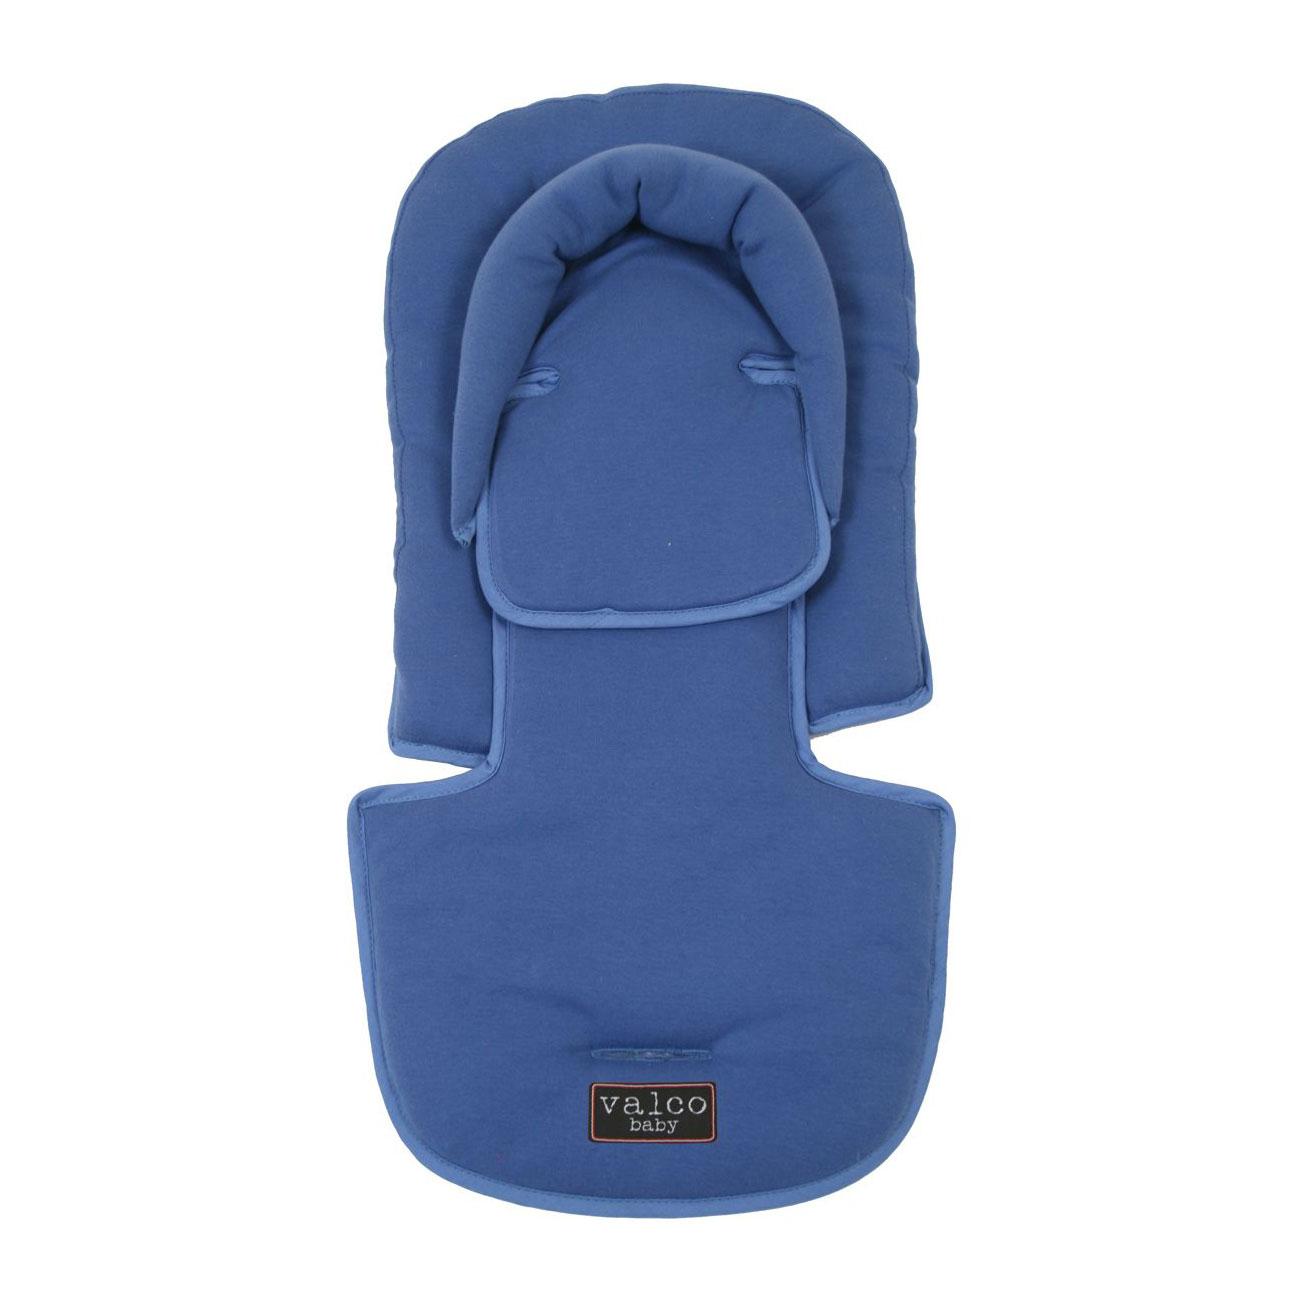 Купить Вкладыш All Sorts Seat Pad / Blue Valco Baby, Нет цвета, см.на уп.